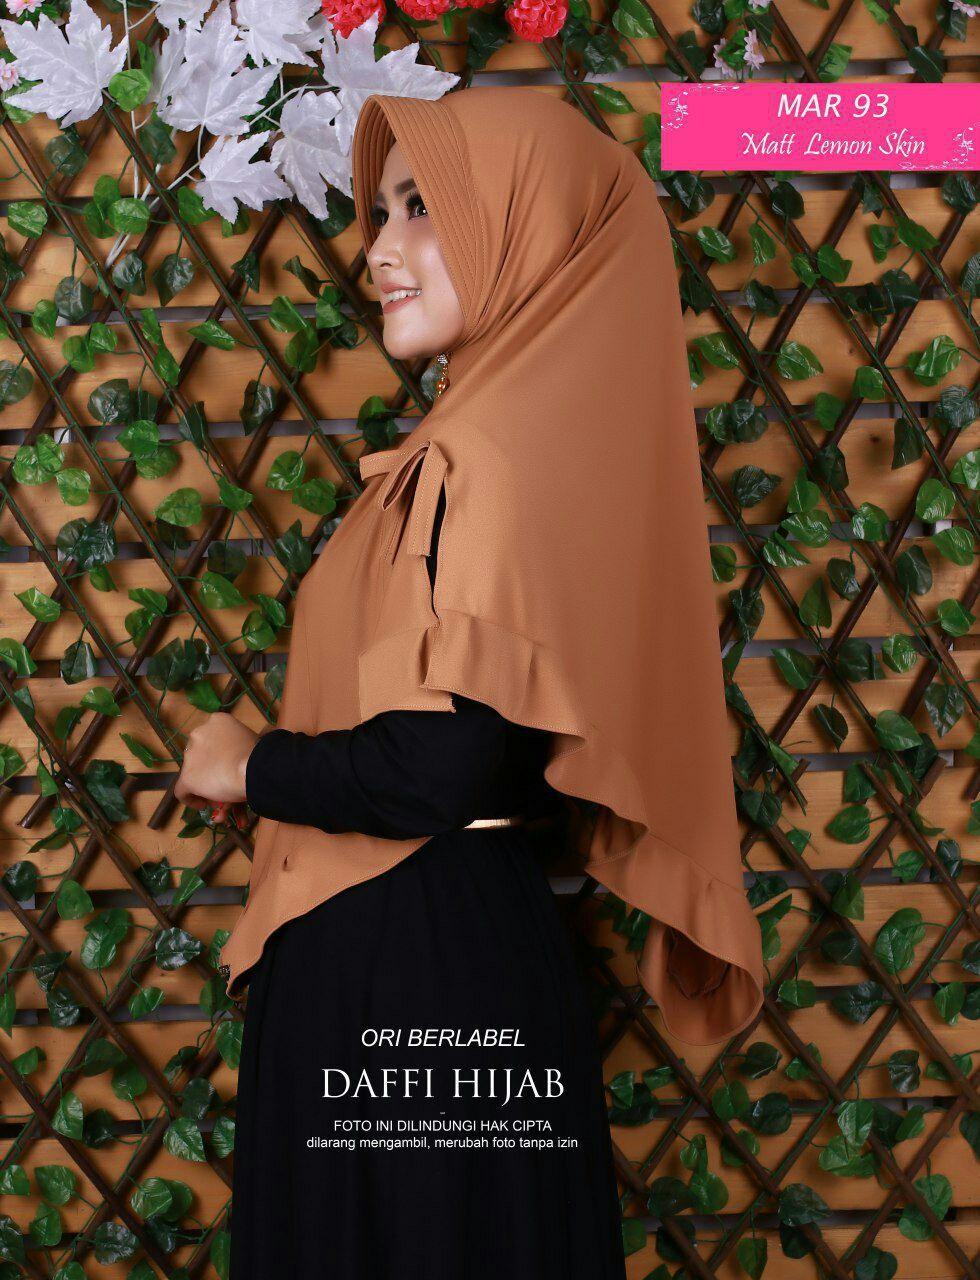 Jilbab Syari Belah Kanan Kiri Jilbab Bahan Lemon Skin Model Belah